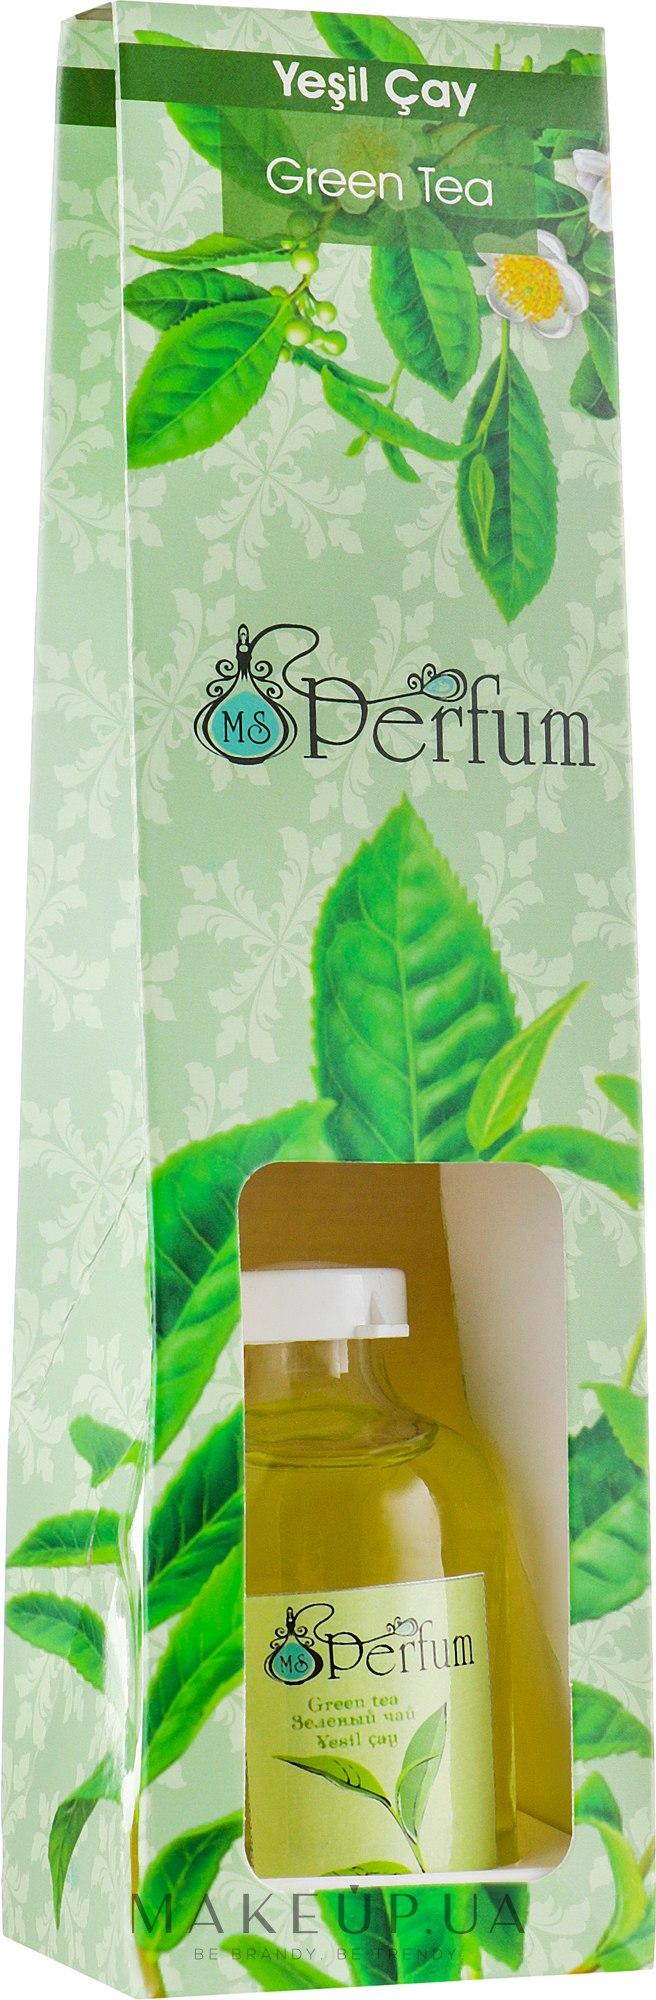 чай биошань зеленый чай отзывы